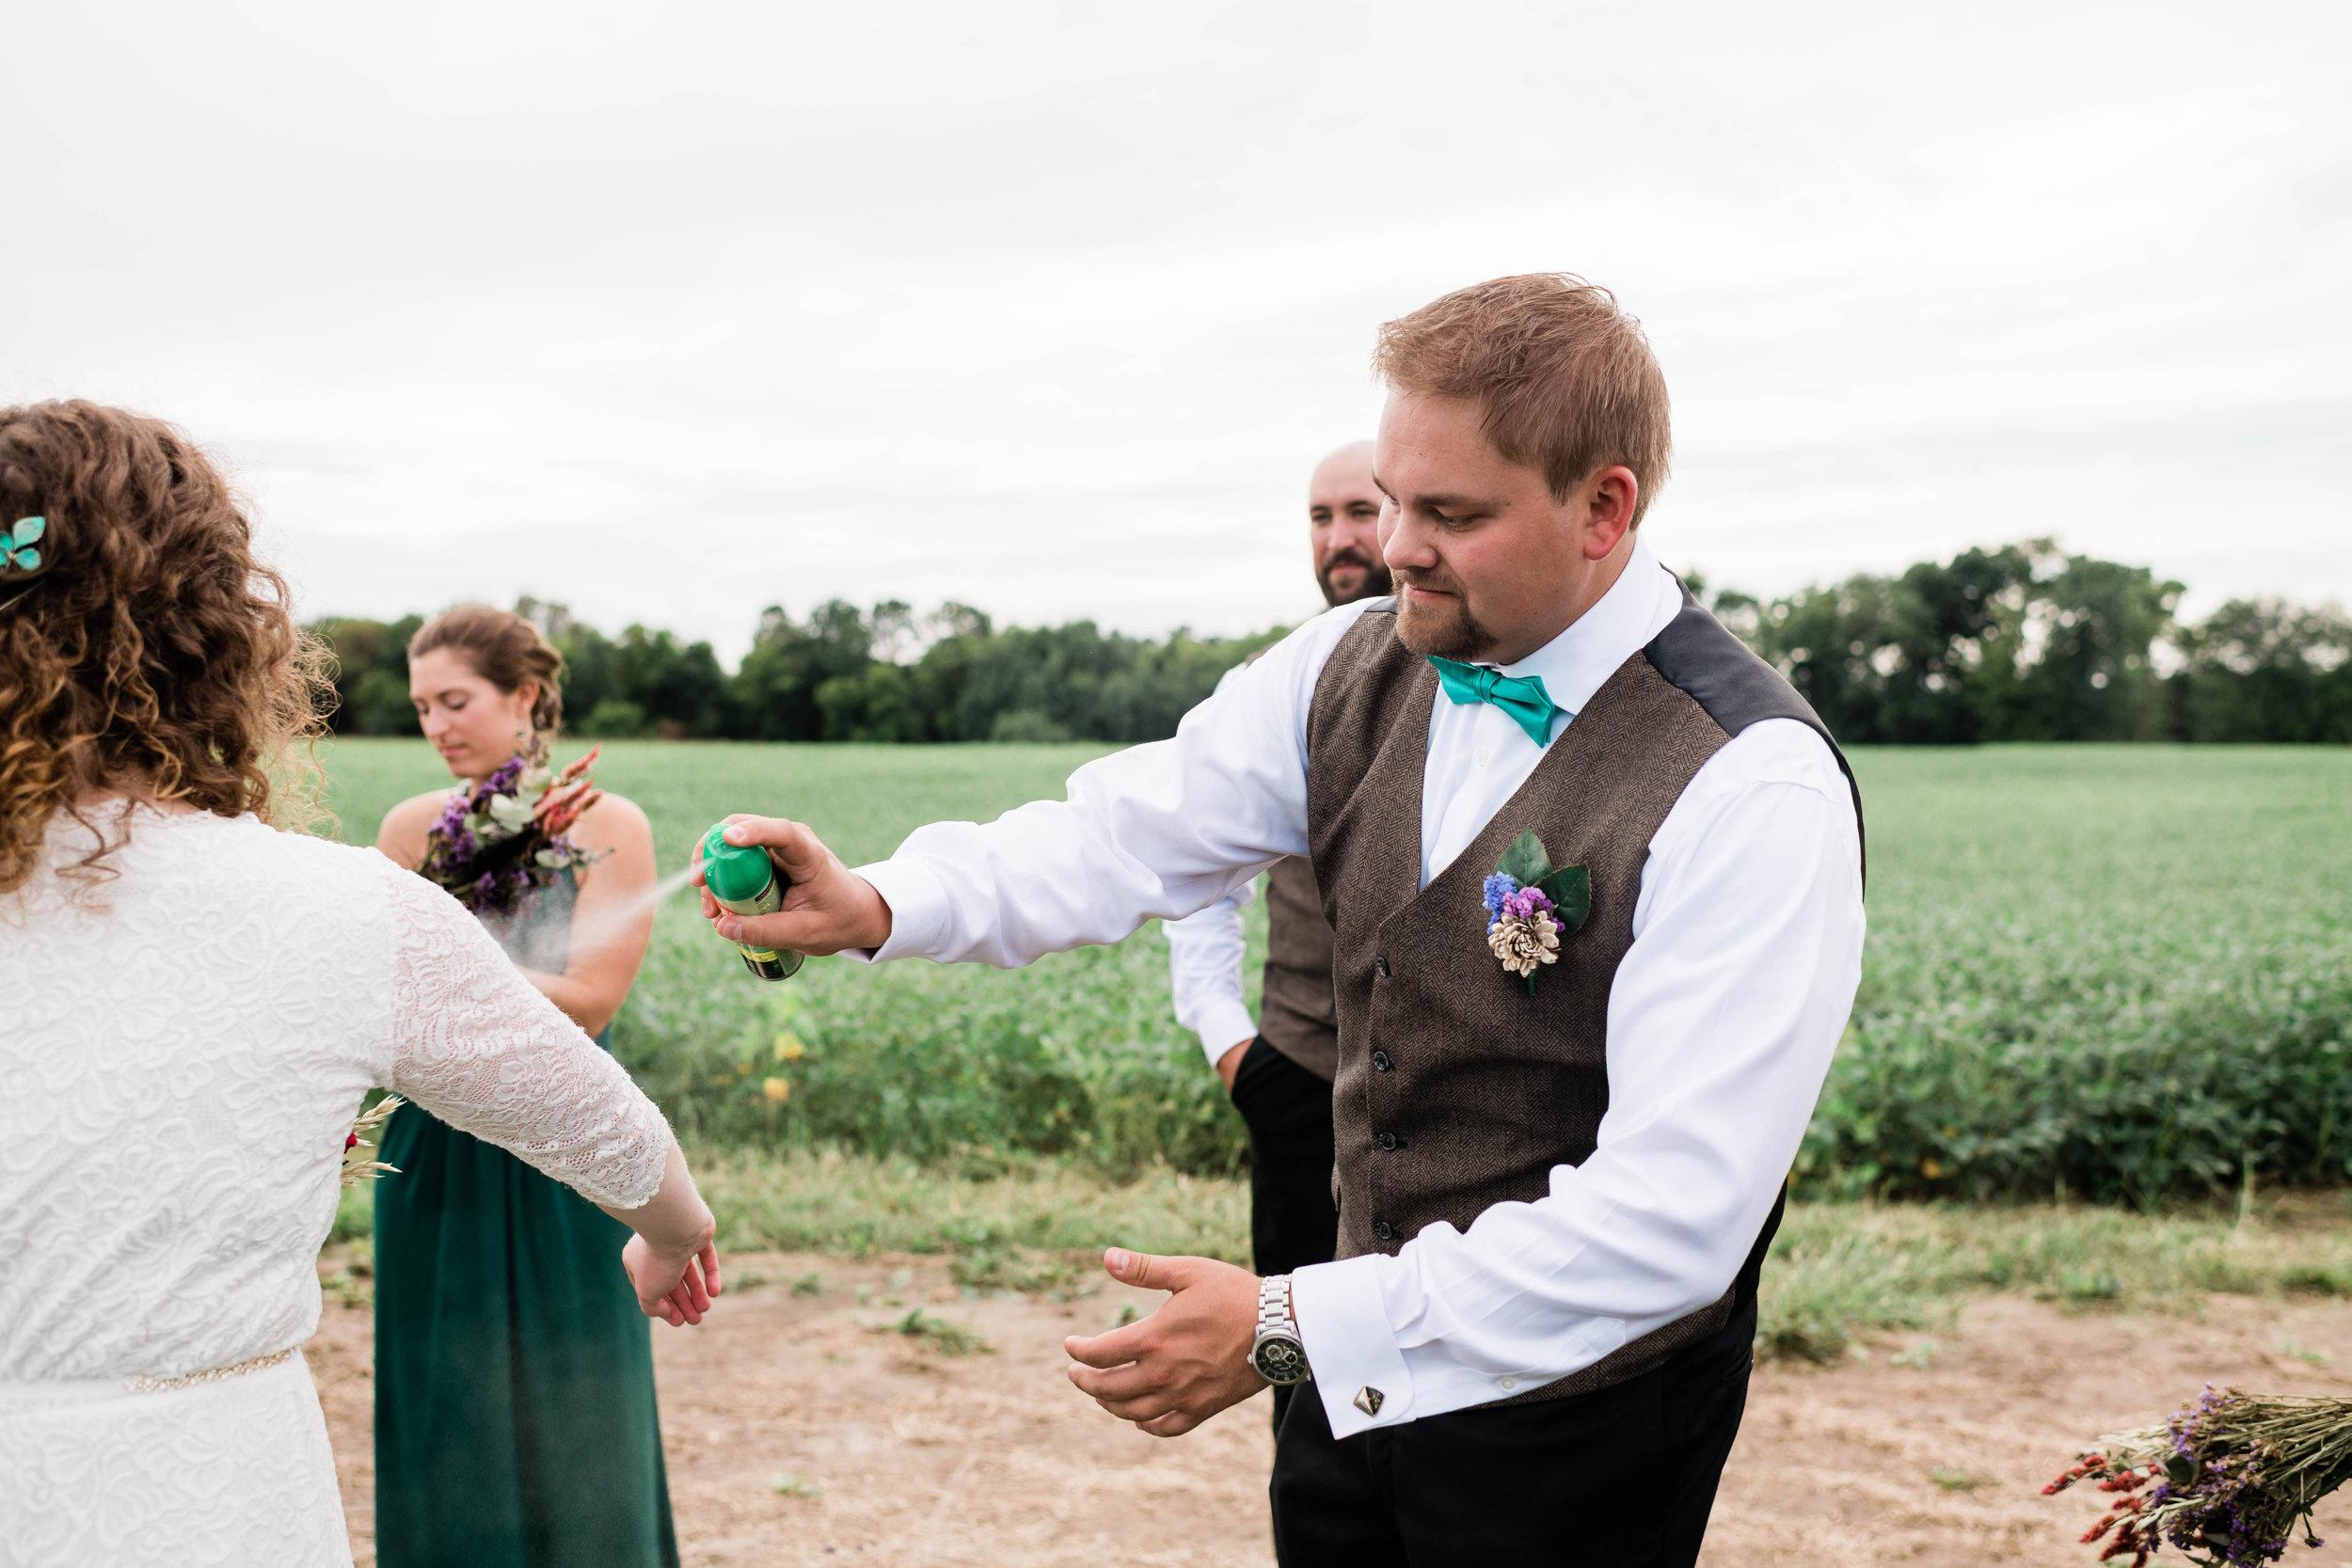 Groomsmen spraying bride with bug repellant